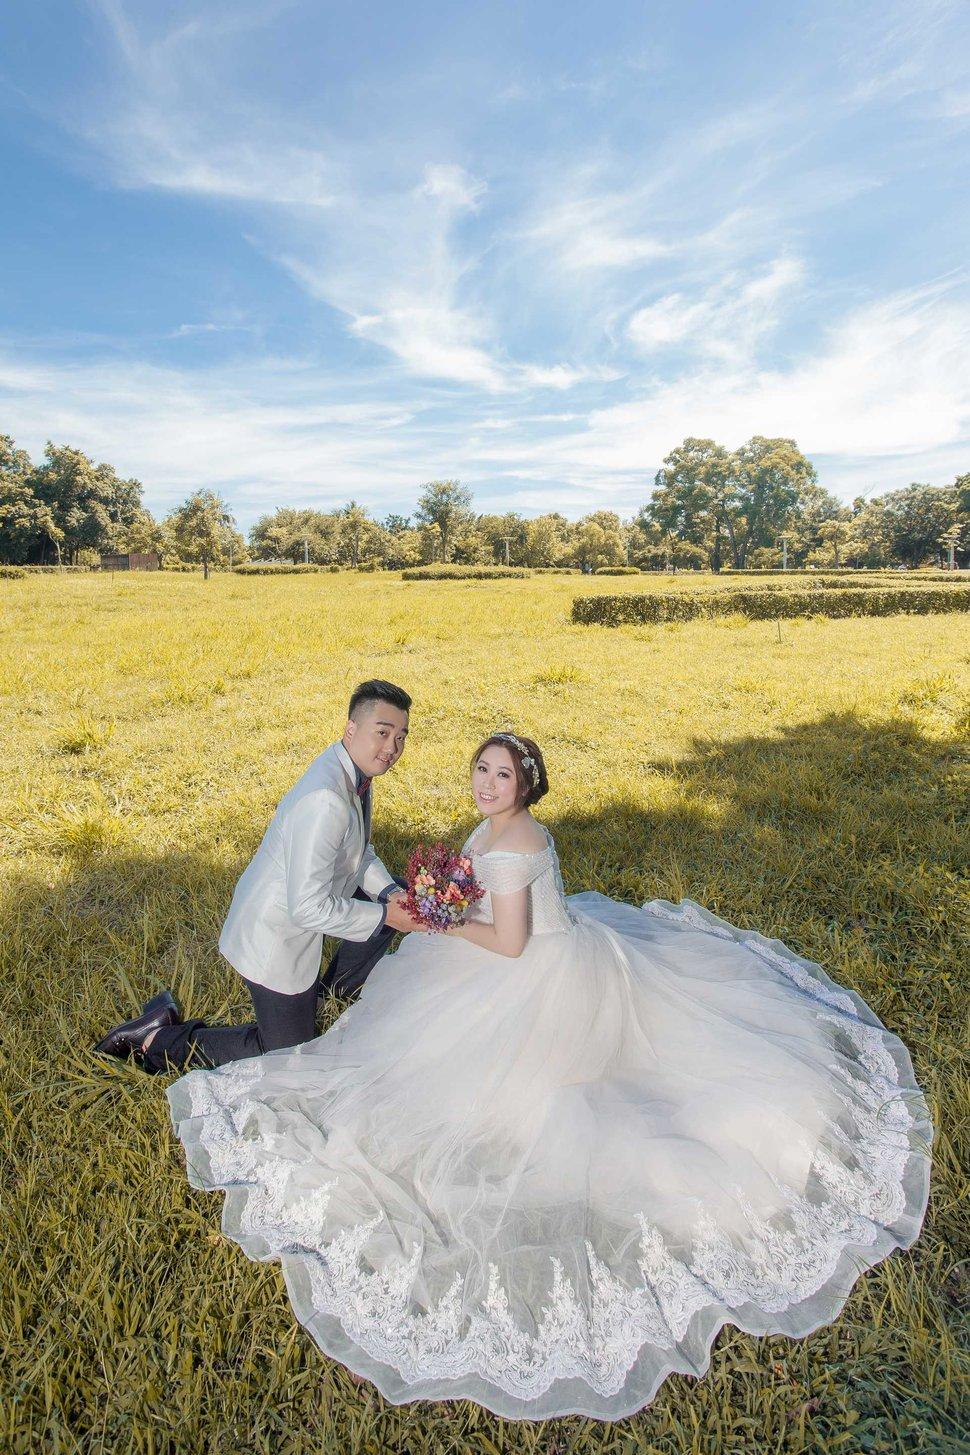 Wedding_Photo_2017_-010 - 台中新秘Lynn《結婚吧》